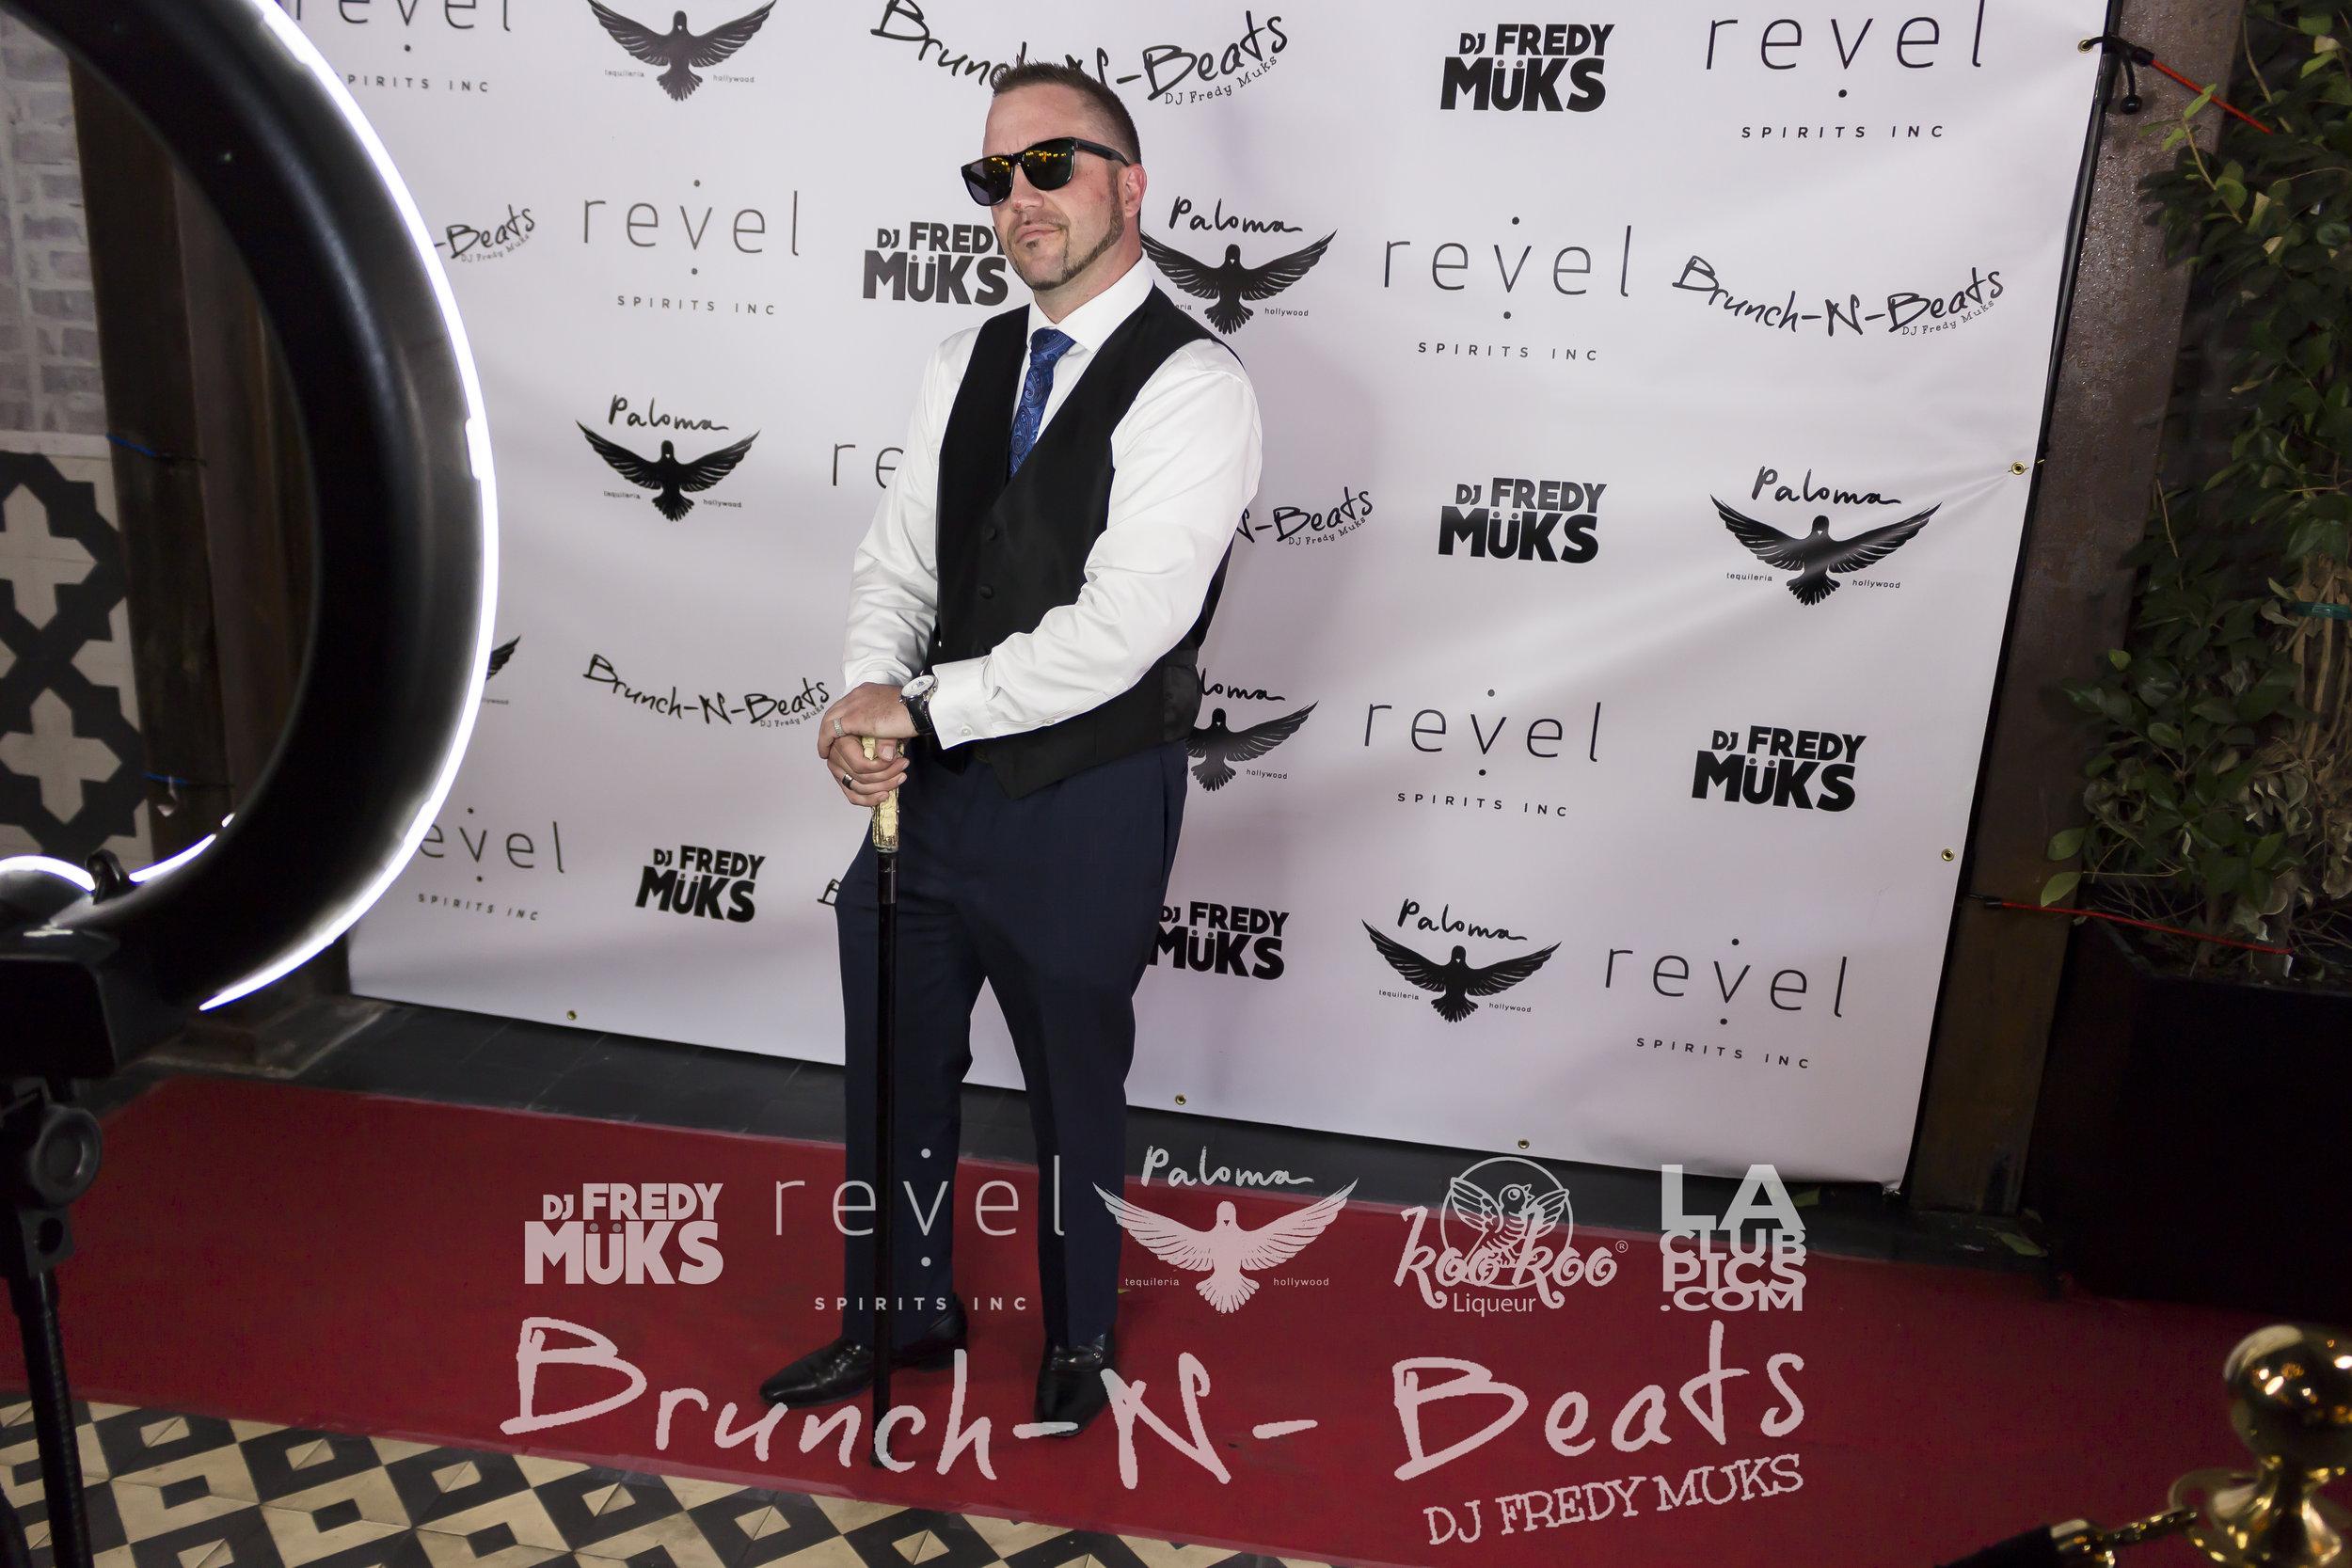 Brunch-N-Beats - Paloma Hollywood - 02-25-18_21.jpg